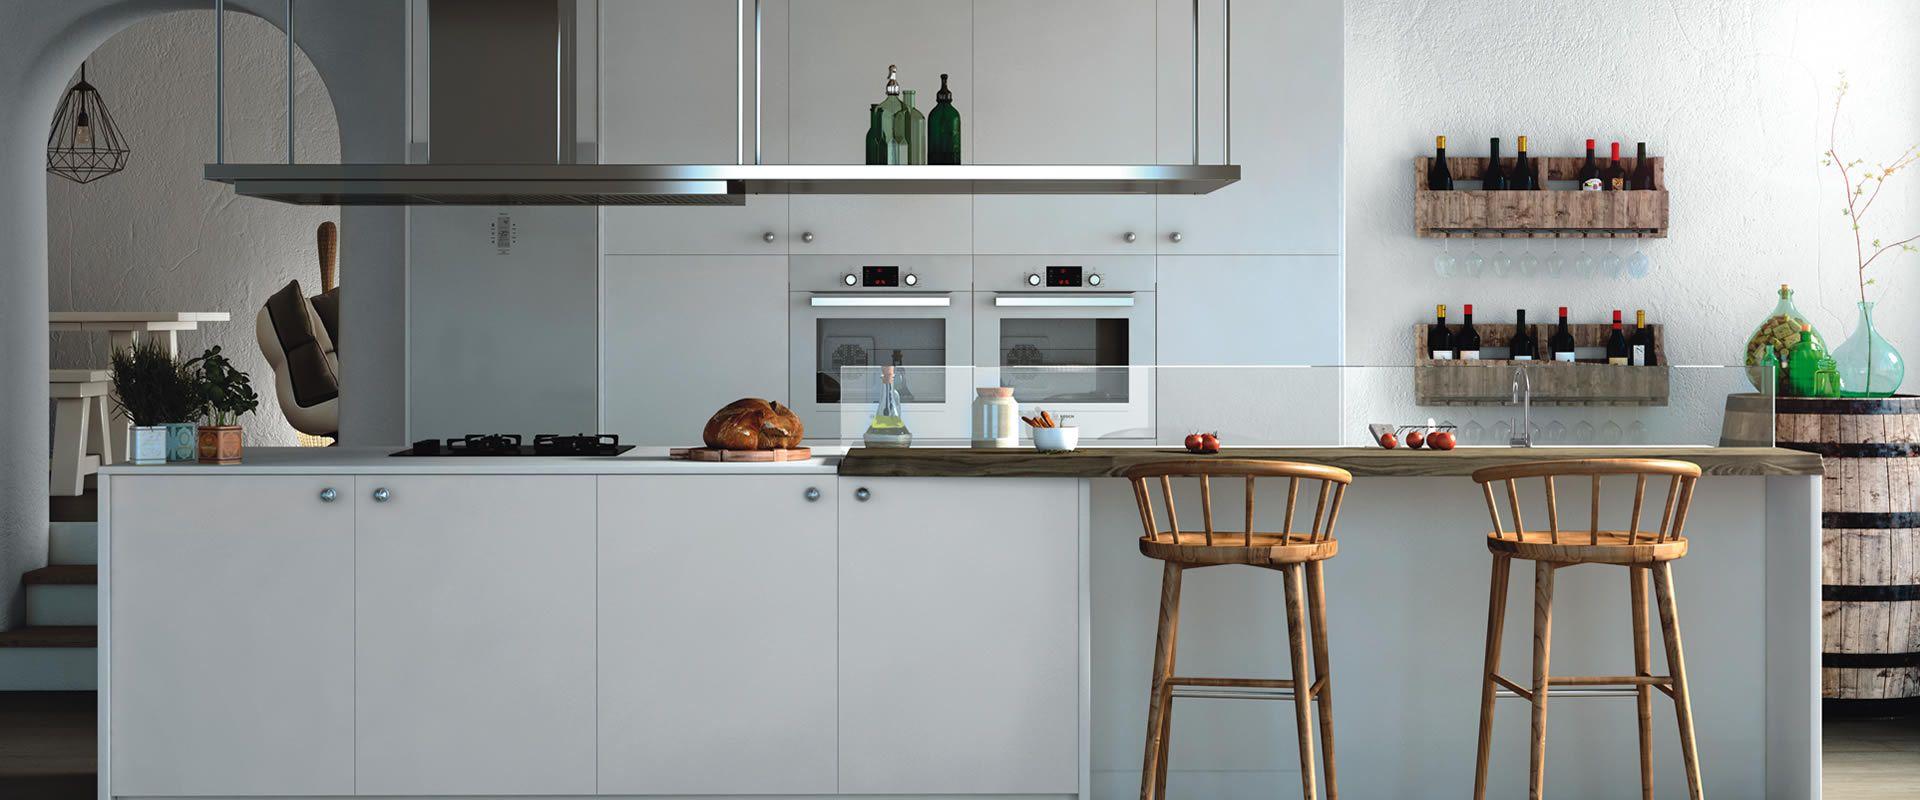 Expertos en fabricación e instalación de muebles de cocina